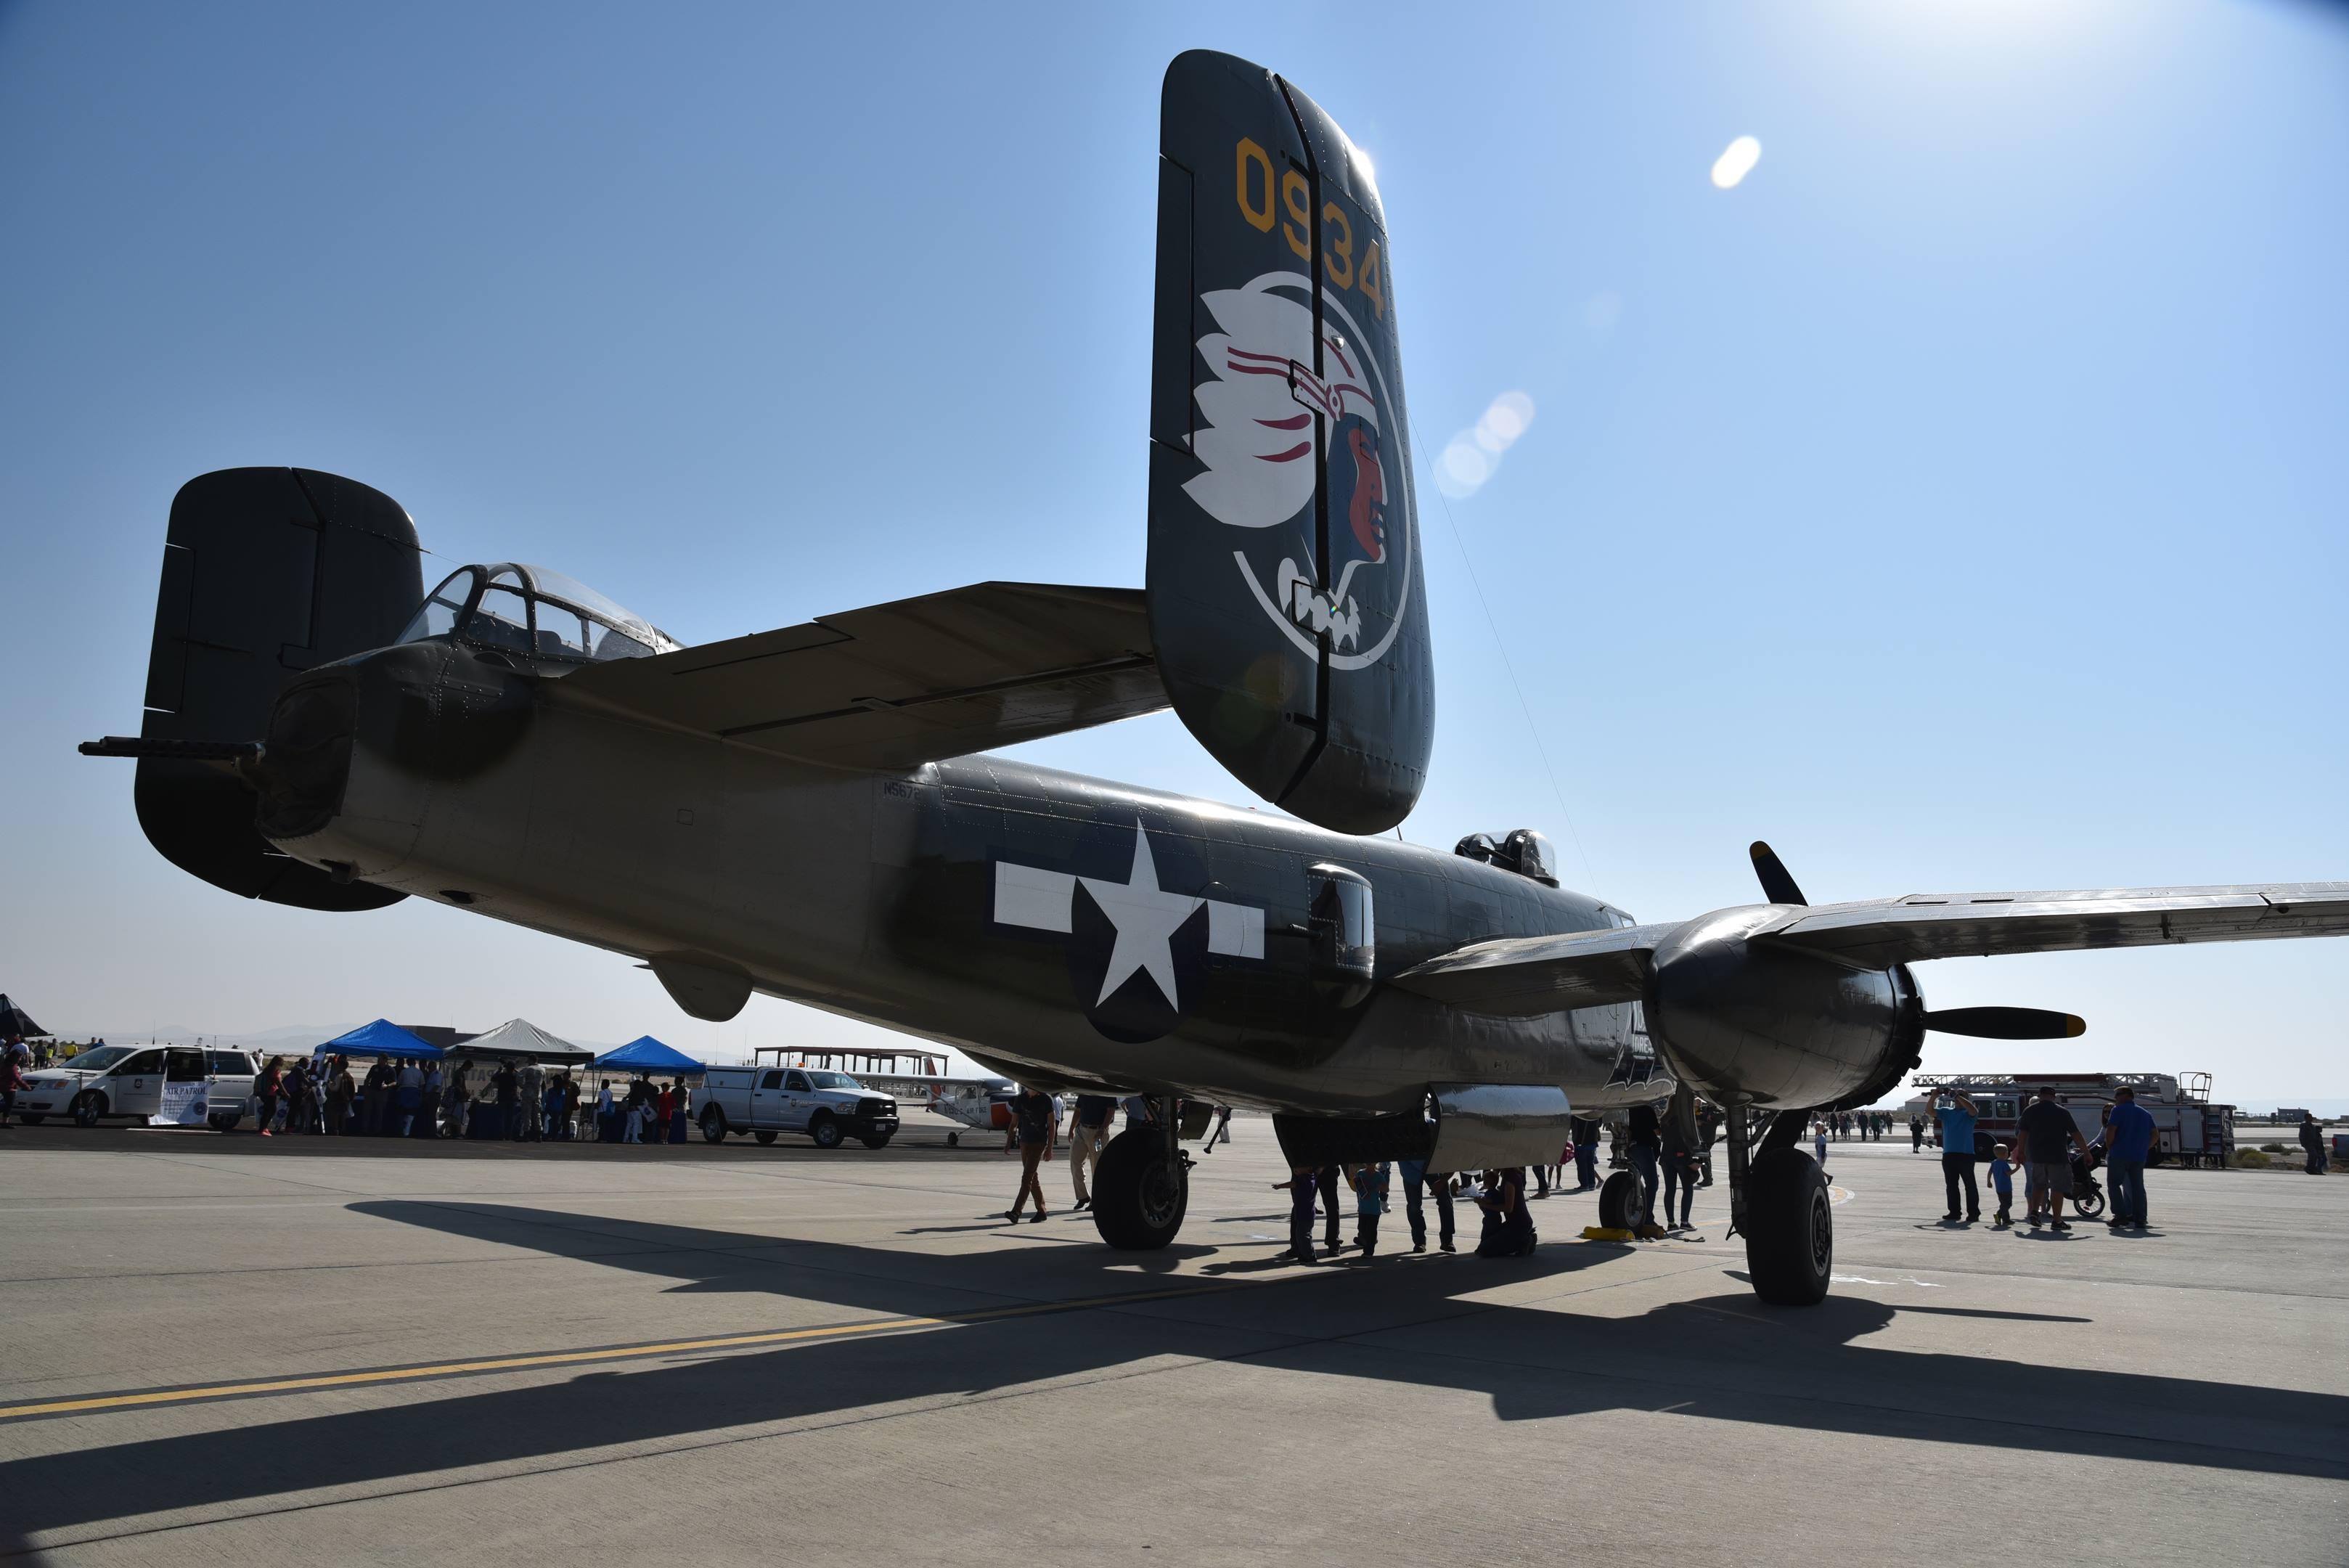 north american b-25 mitchell 0934 betty's dream